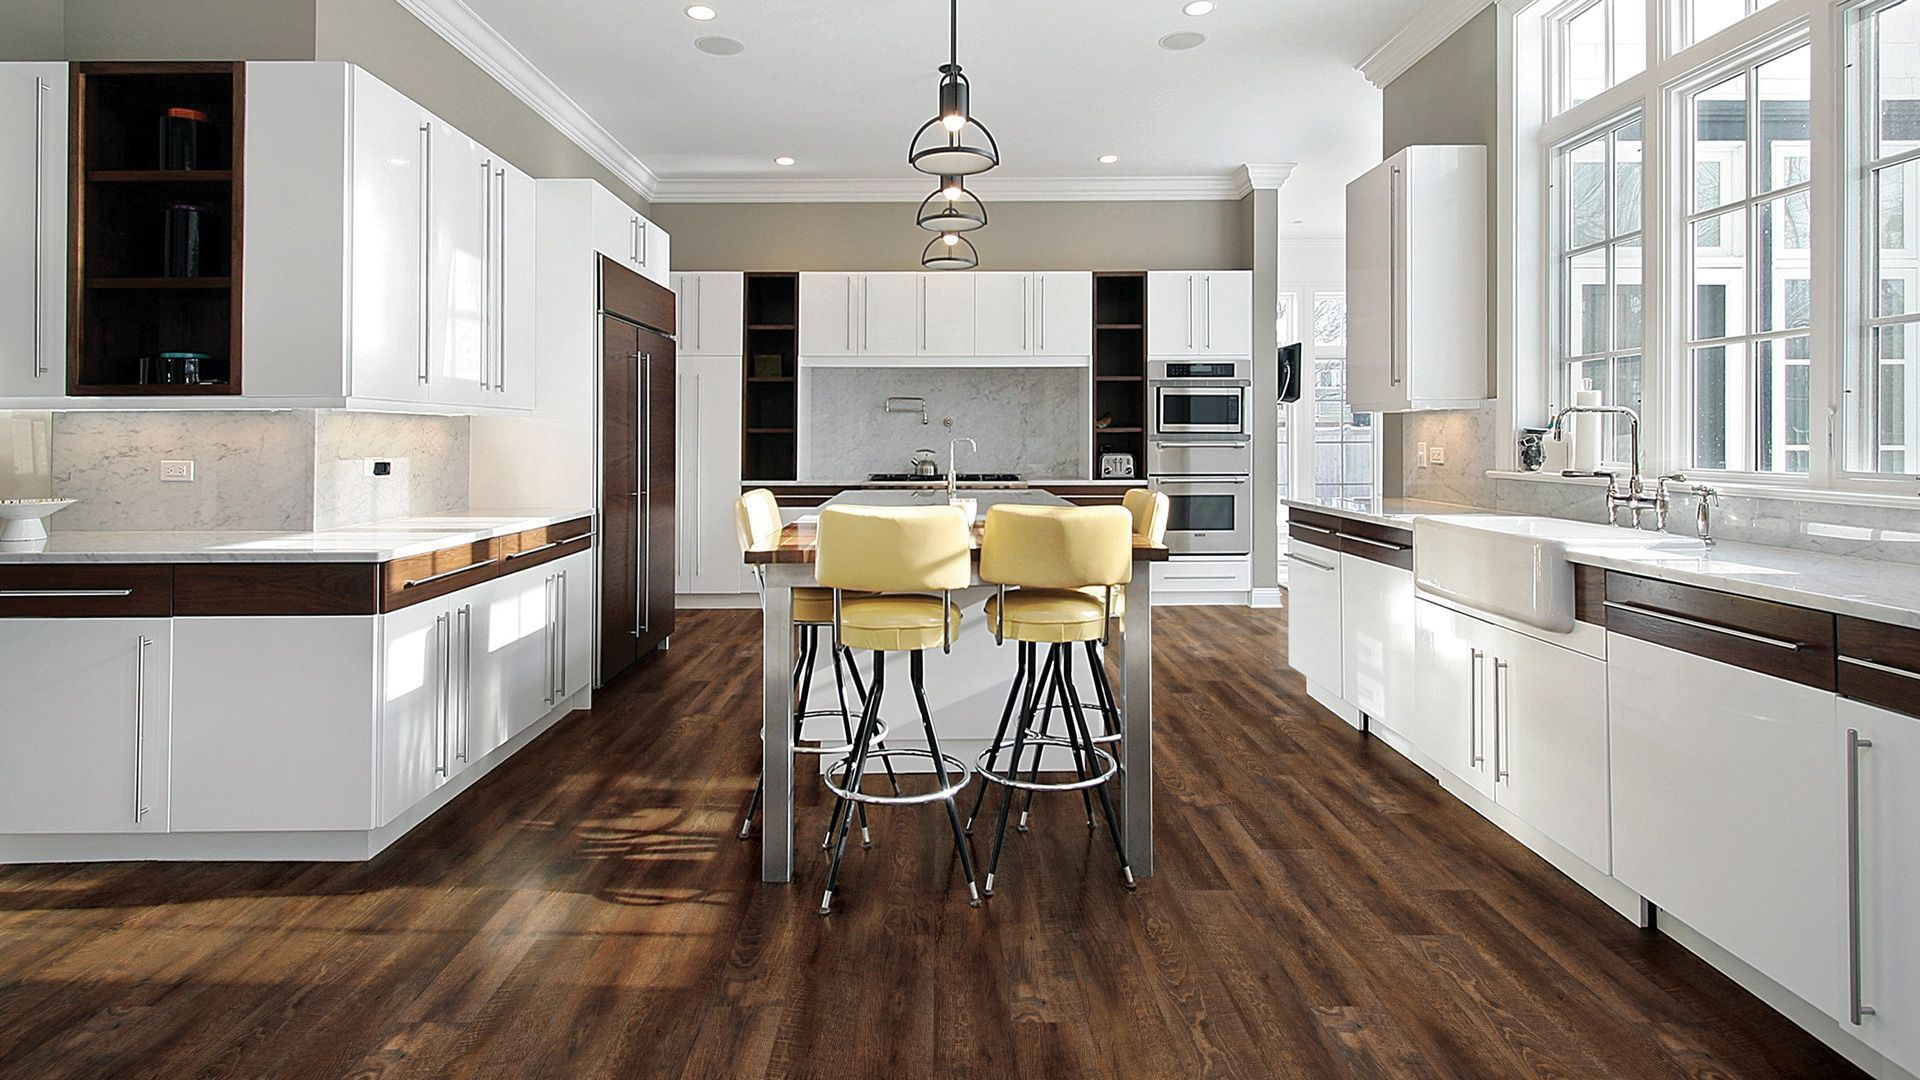 vinyl flooring trends 4 hot vinyl flooring ideas 2018 white modern kitchen luxury kitchen on kitchen remodel vinyl flooring id=19369